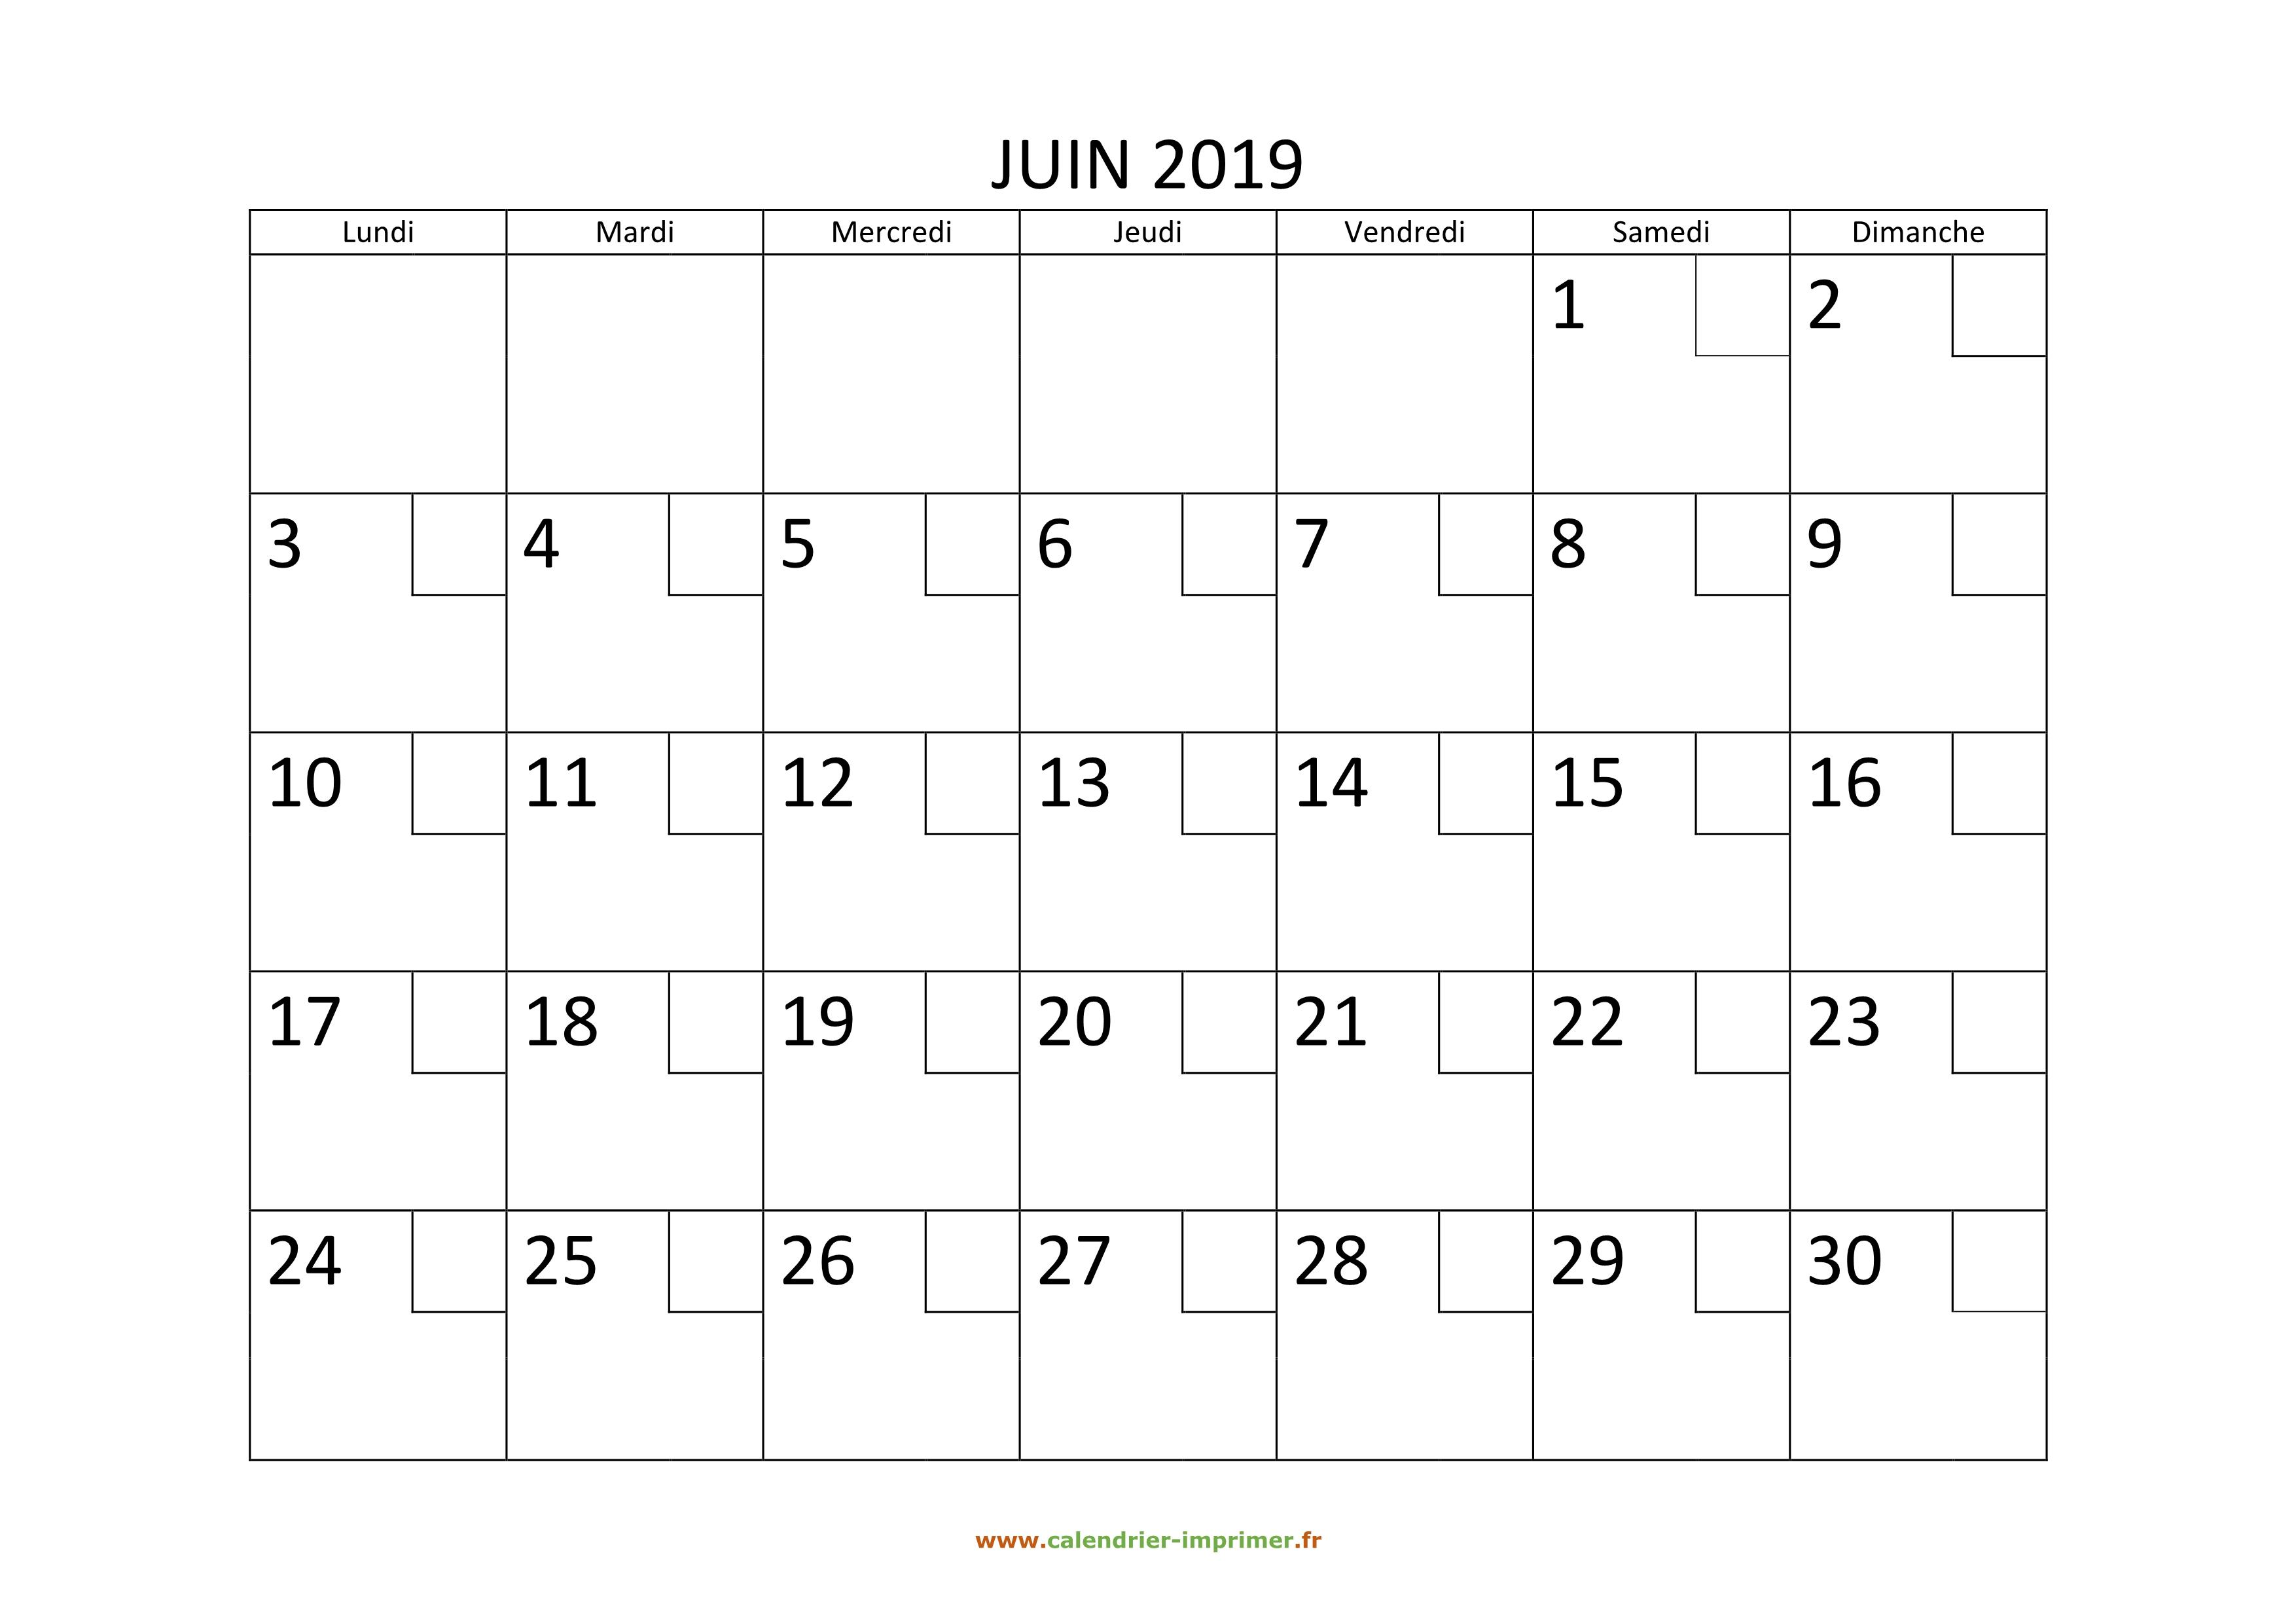 Calendrier Mensuel Juin 2019.Calendrier Juin 2019 A Imprimer